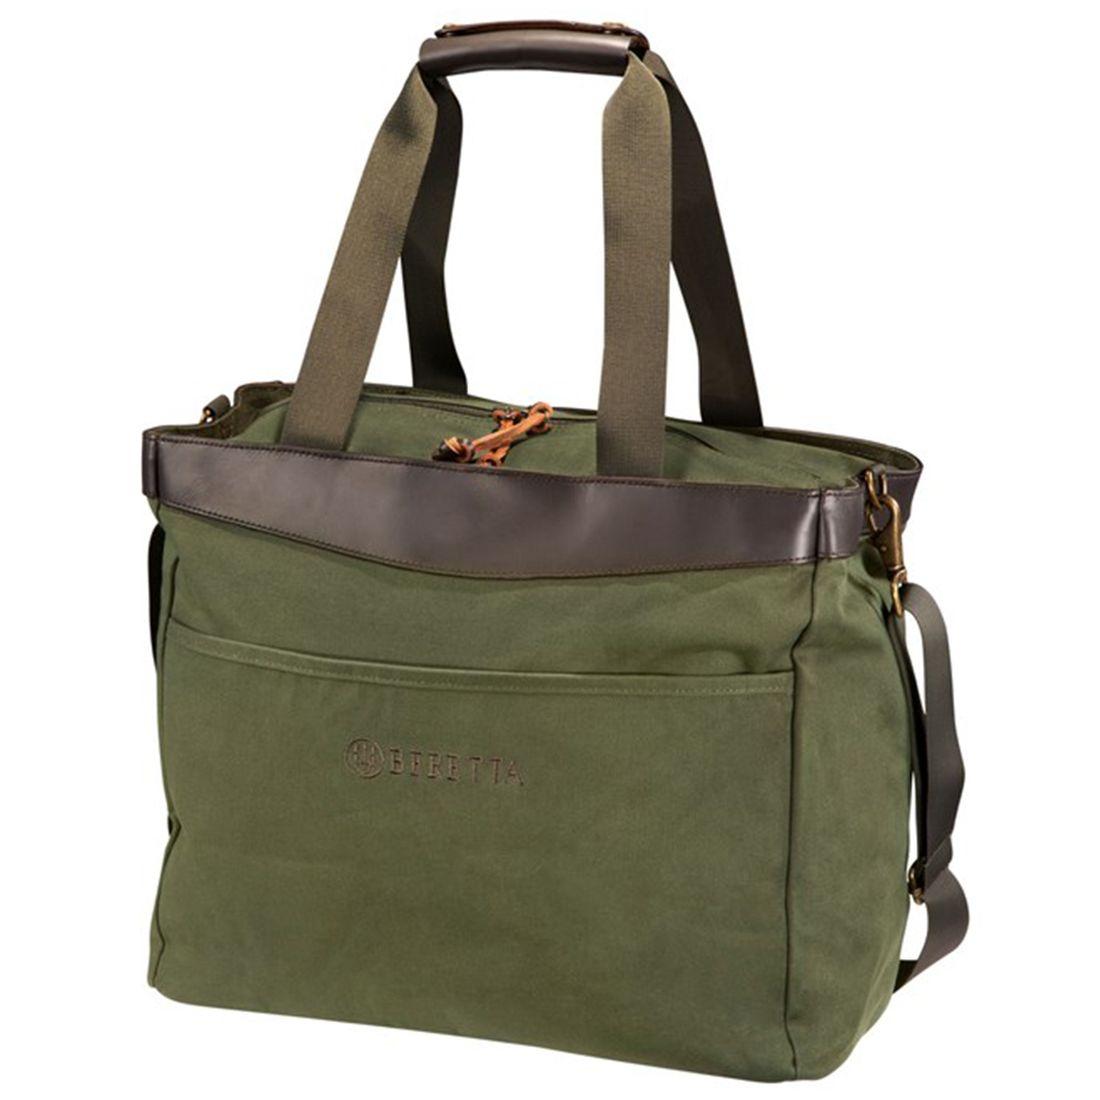 BERETTA Waxwear Large Tote Bag